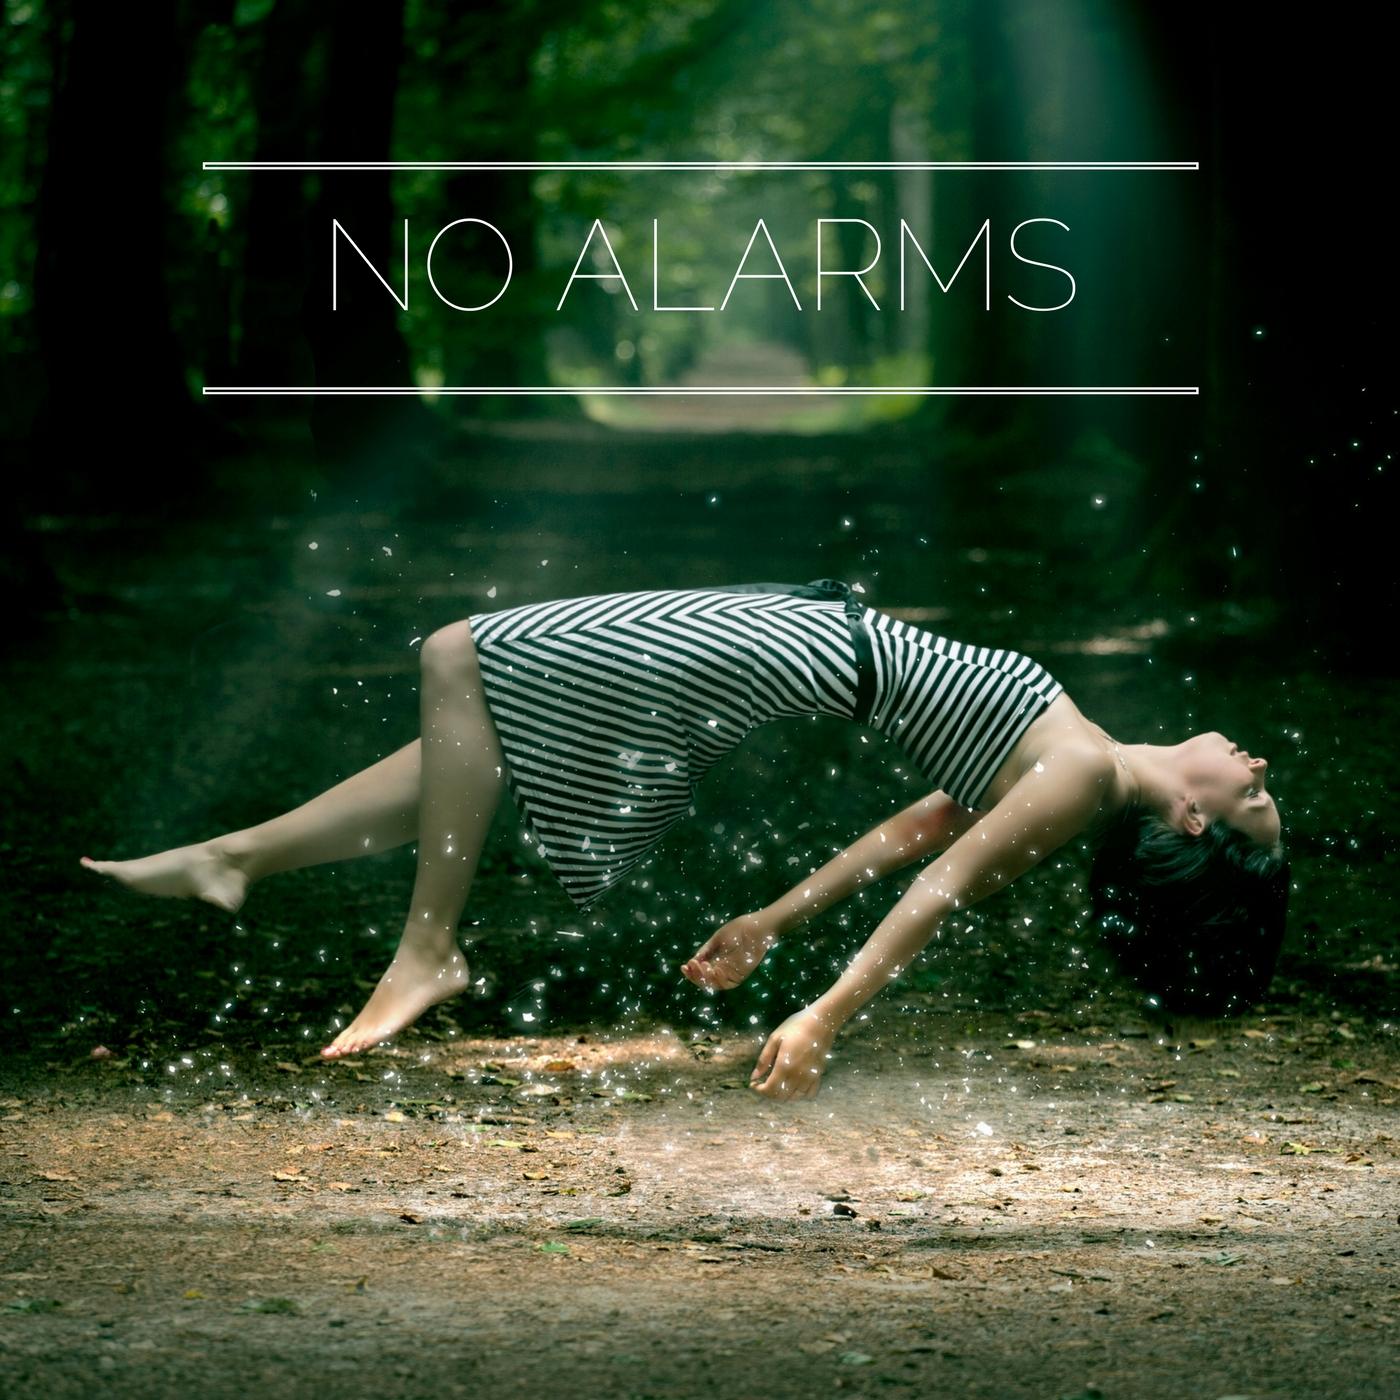 No Alarms - No Alarms EP - Album Art.jpg